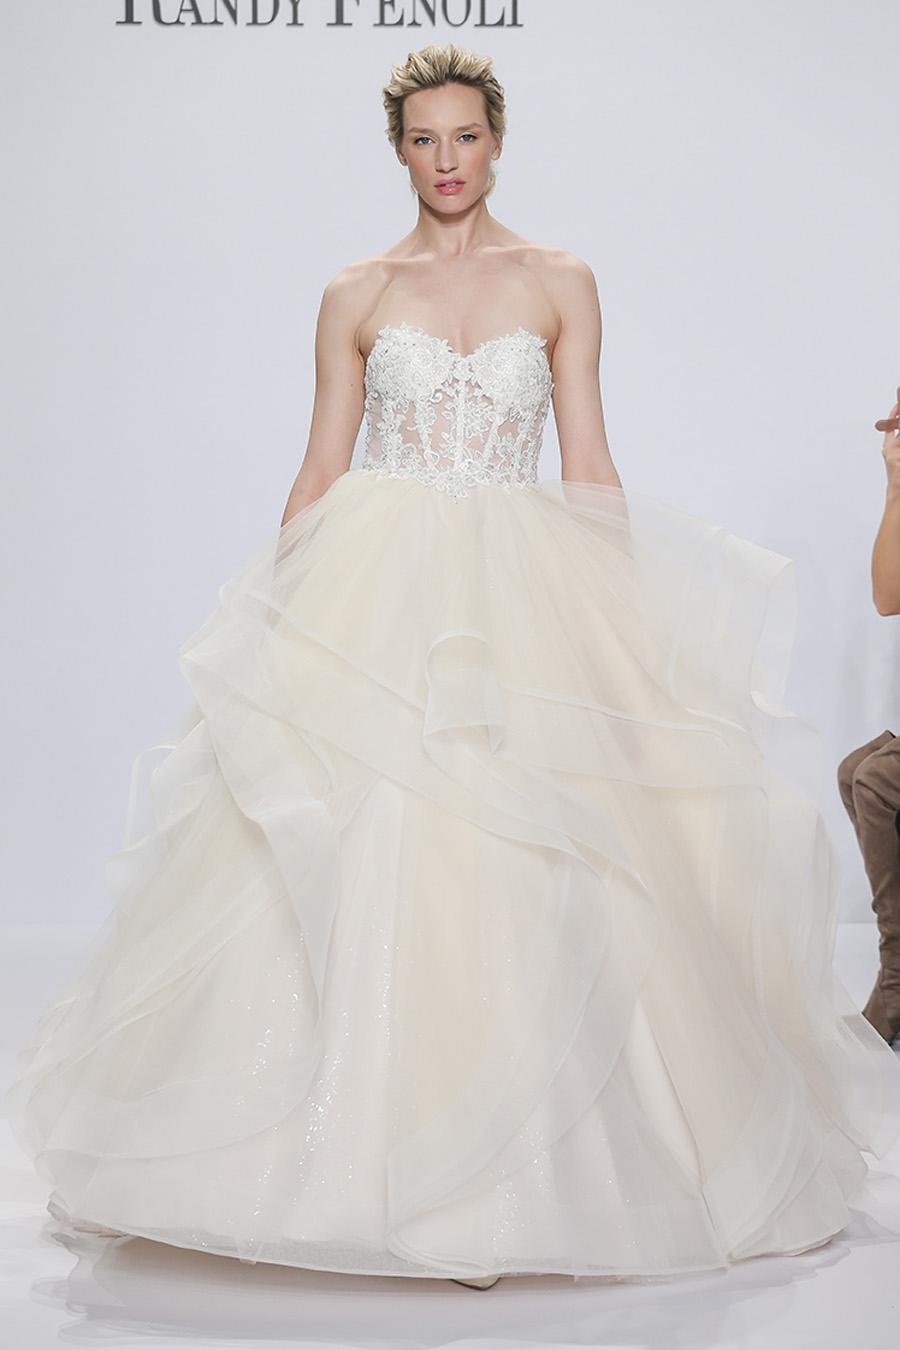 Randy Fenoli Bridal Collection gown 11